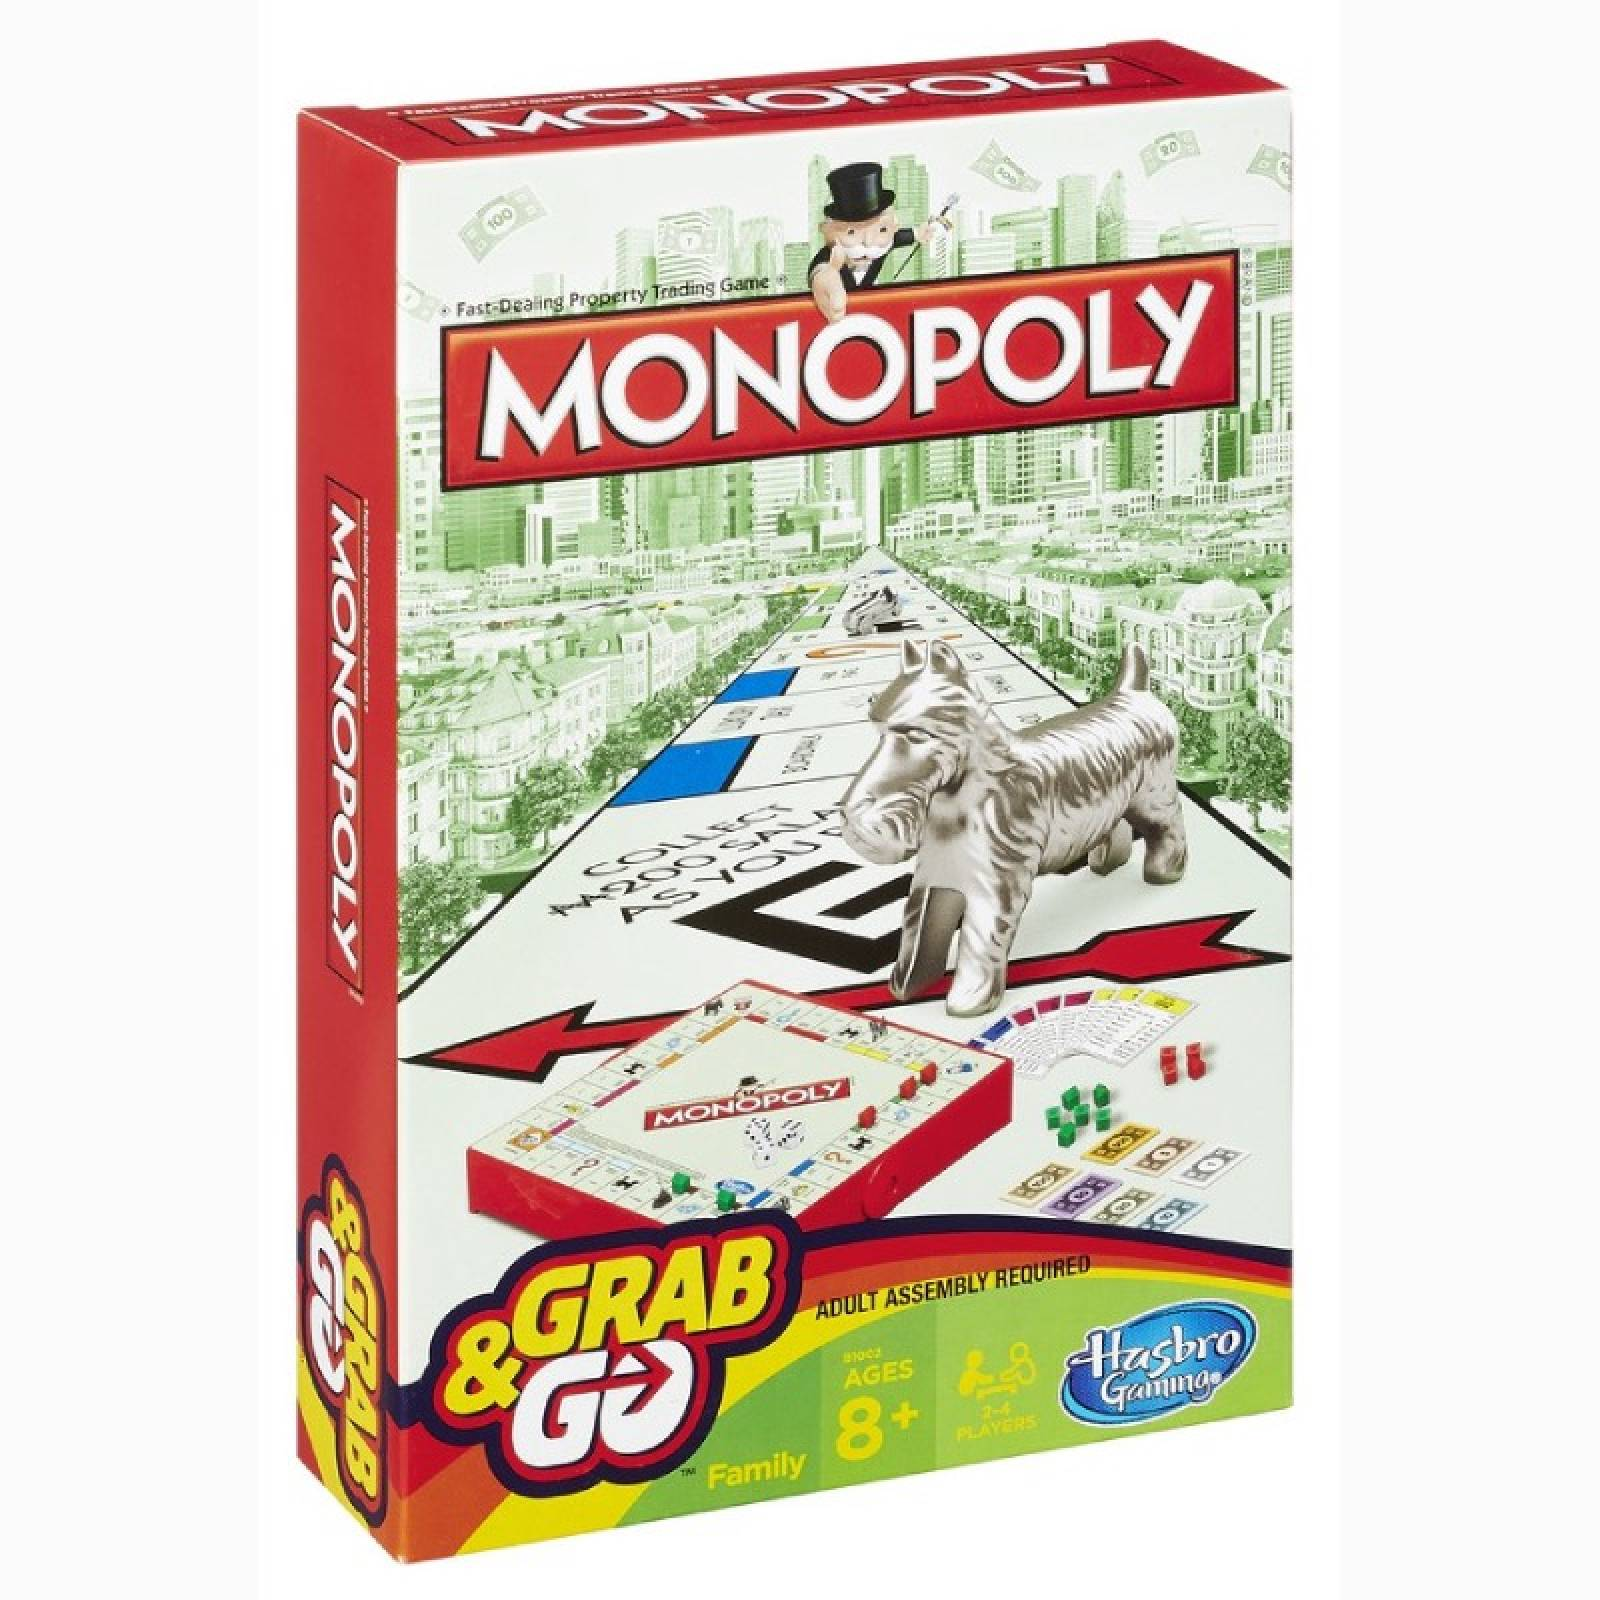 Monopoly Grab & Go Game 8+